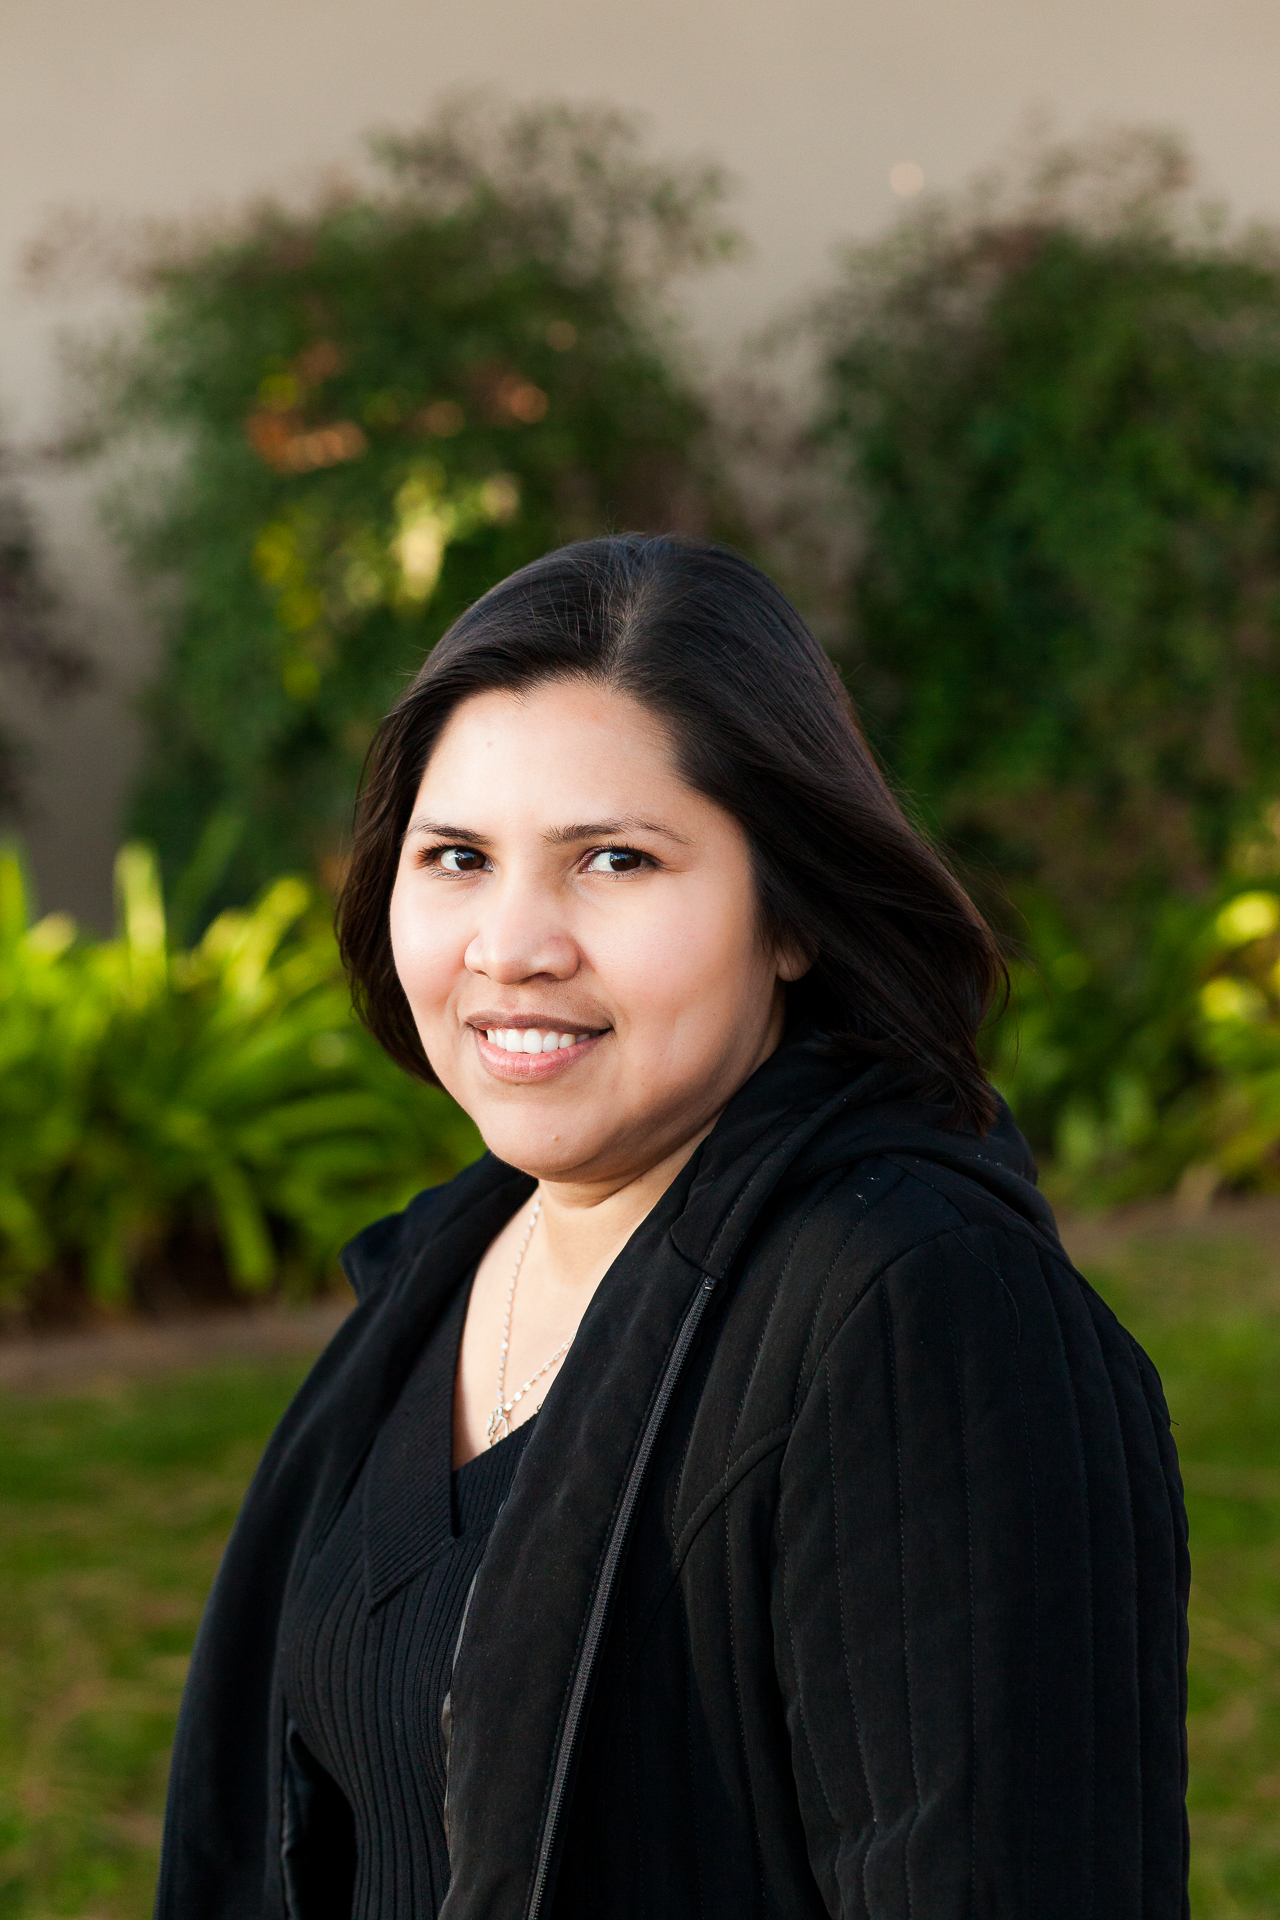 Esmeralda Hernandez-Aguilar